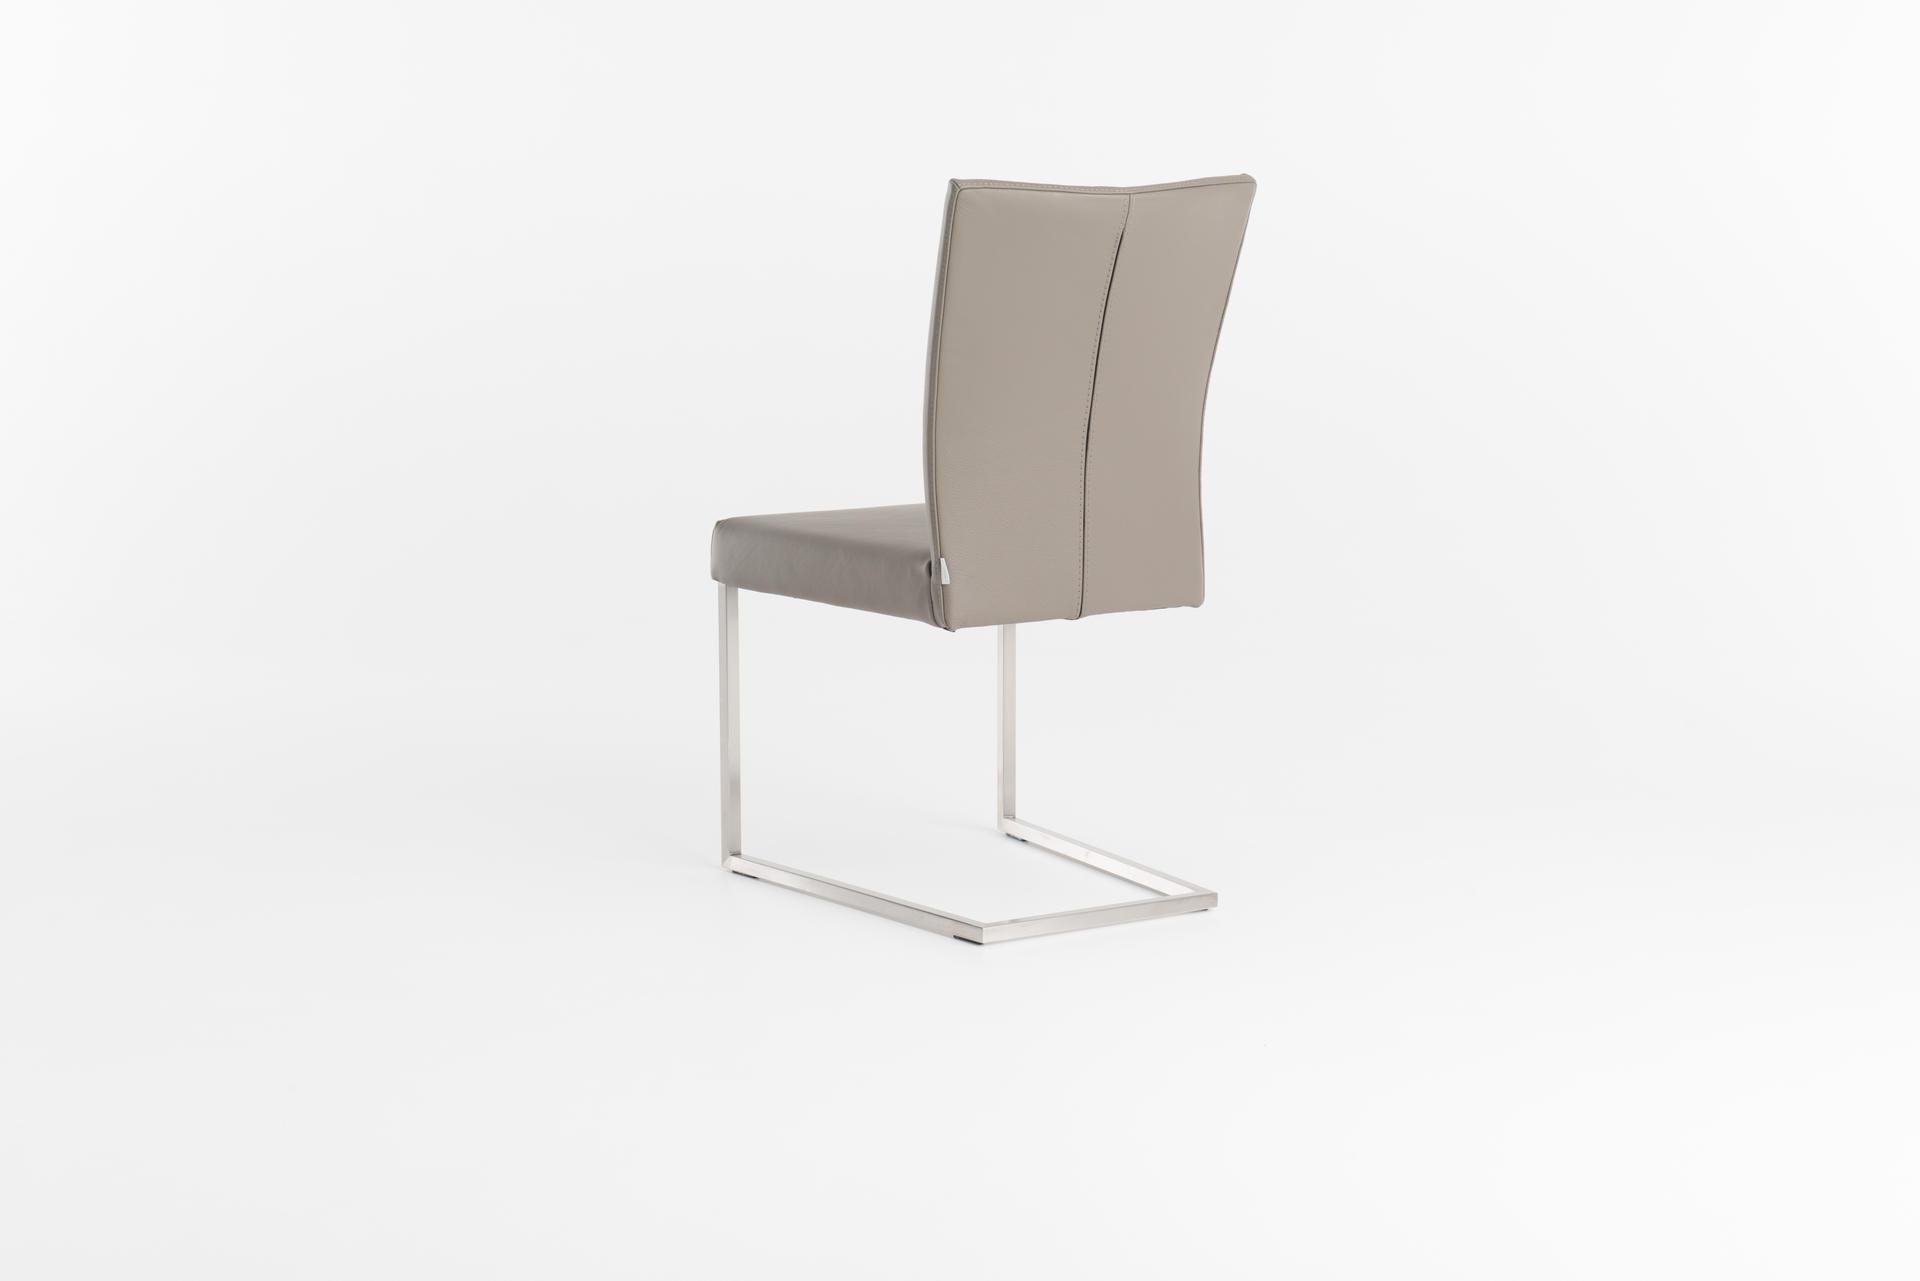 стул Misty, Bert Plantagie, фото 3